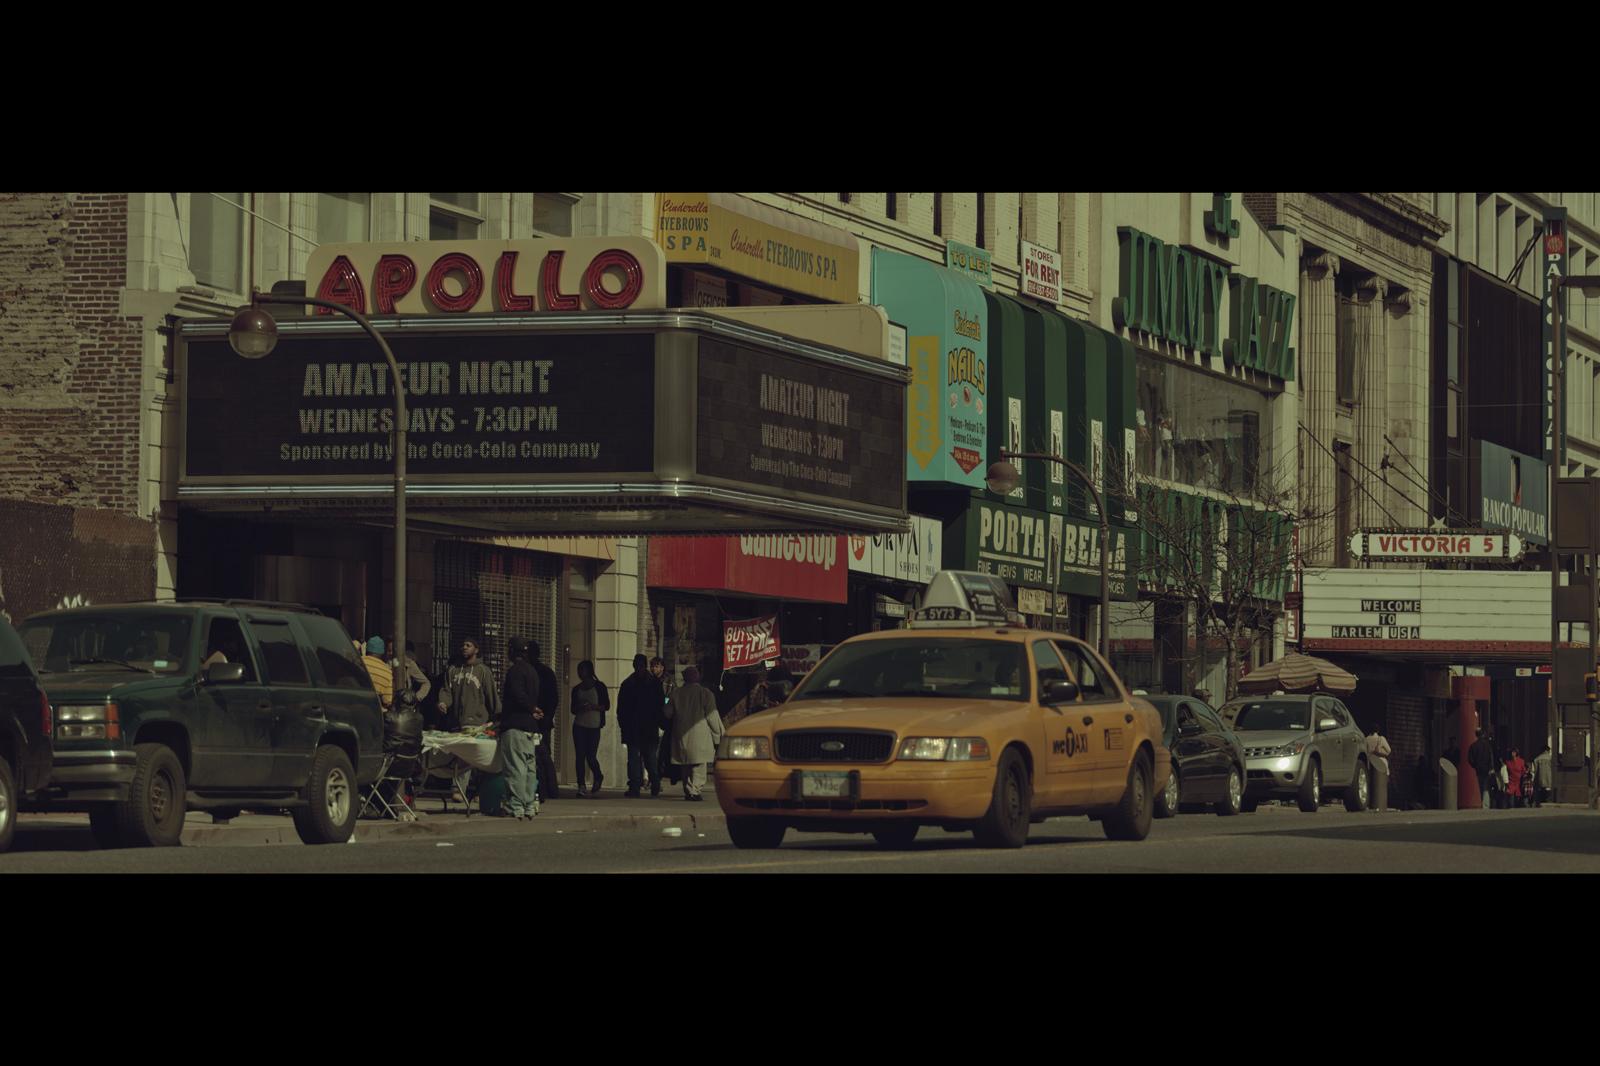 Harlem-Apollo - ©Maxime Villalonga